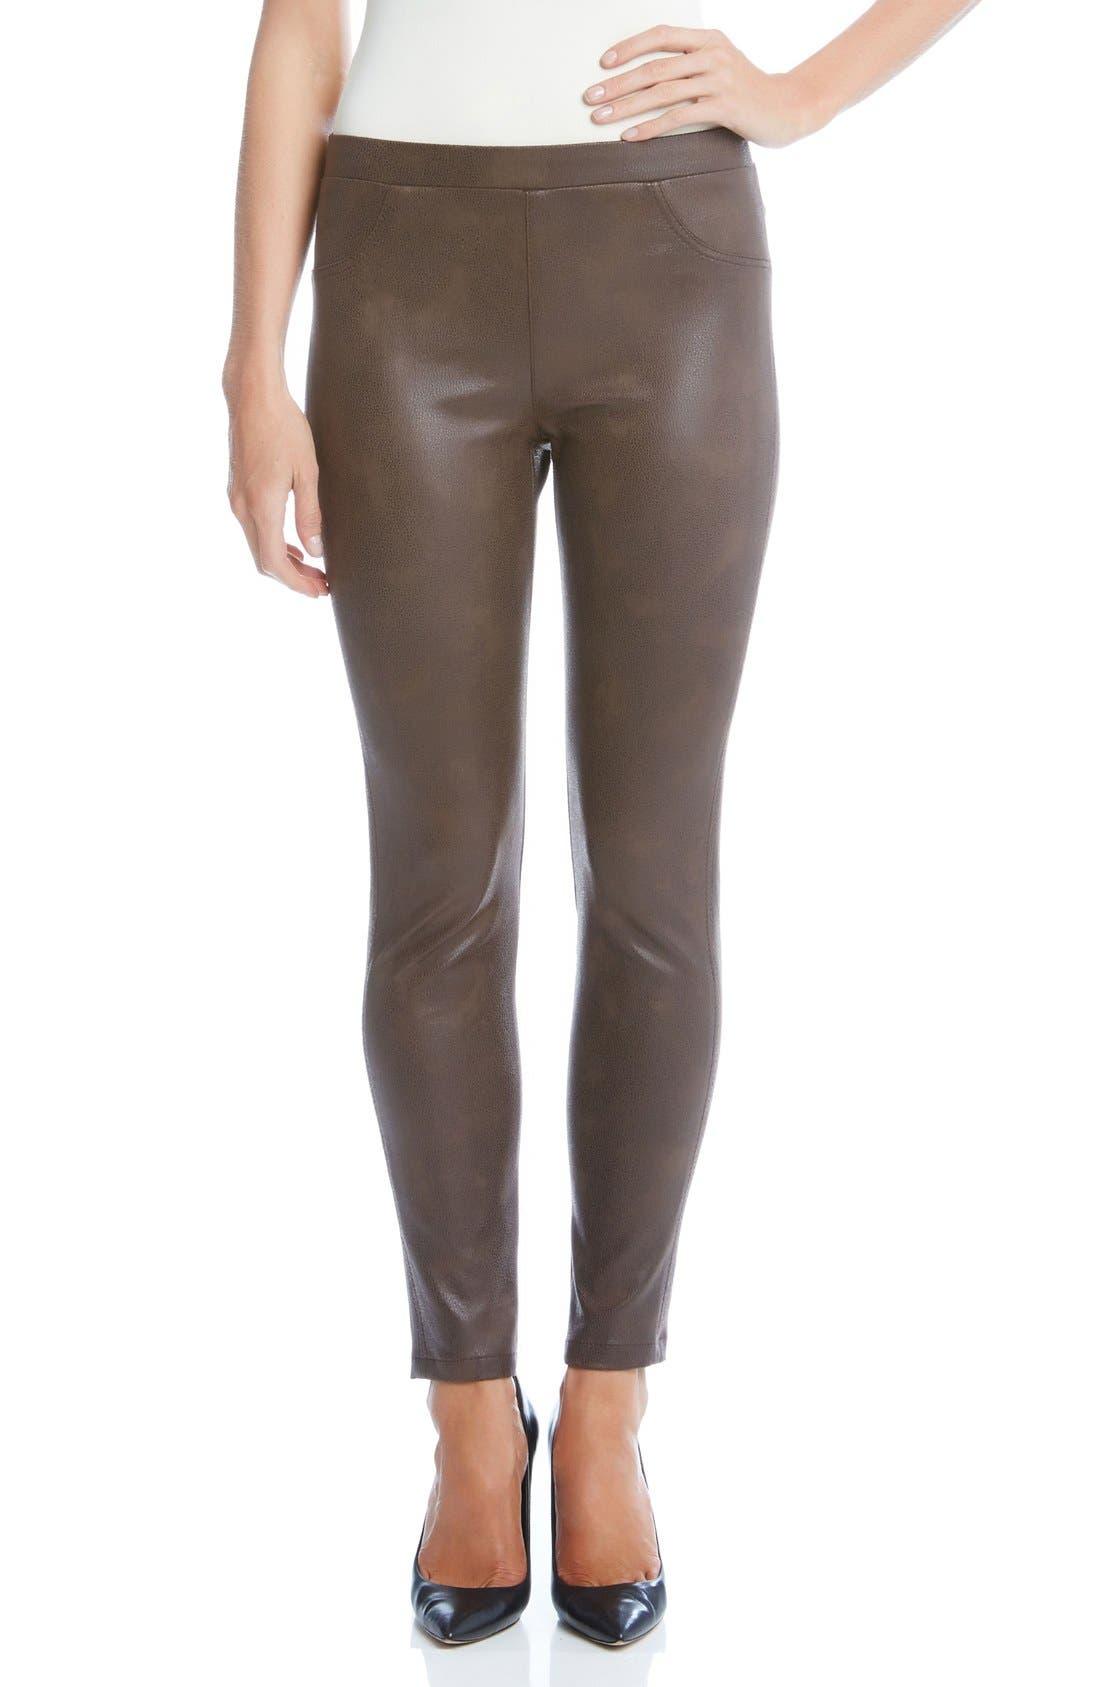 Karen Karen Stretch Faux Leather Skinny Pants,                             Main thumbnail 1, color,                             200